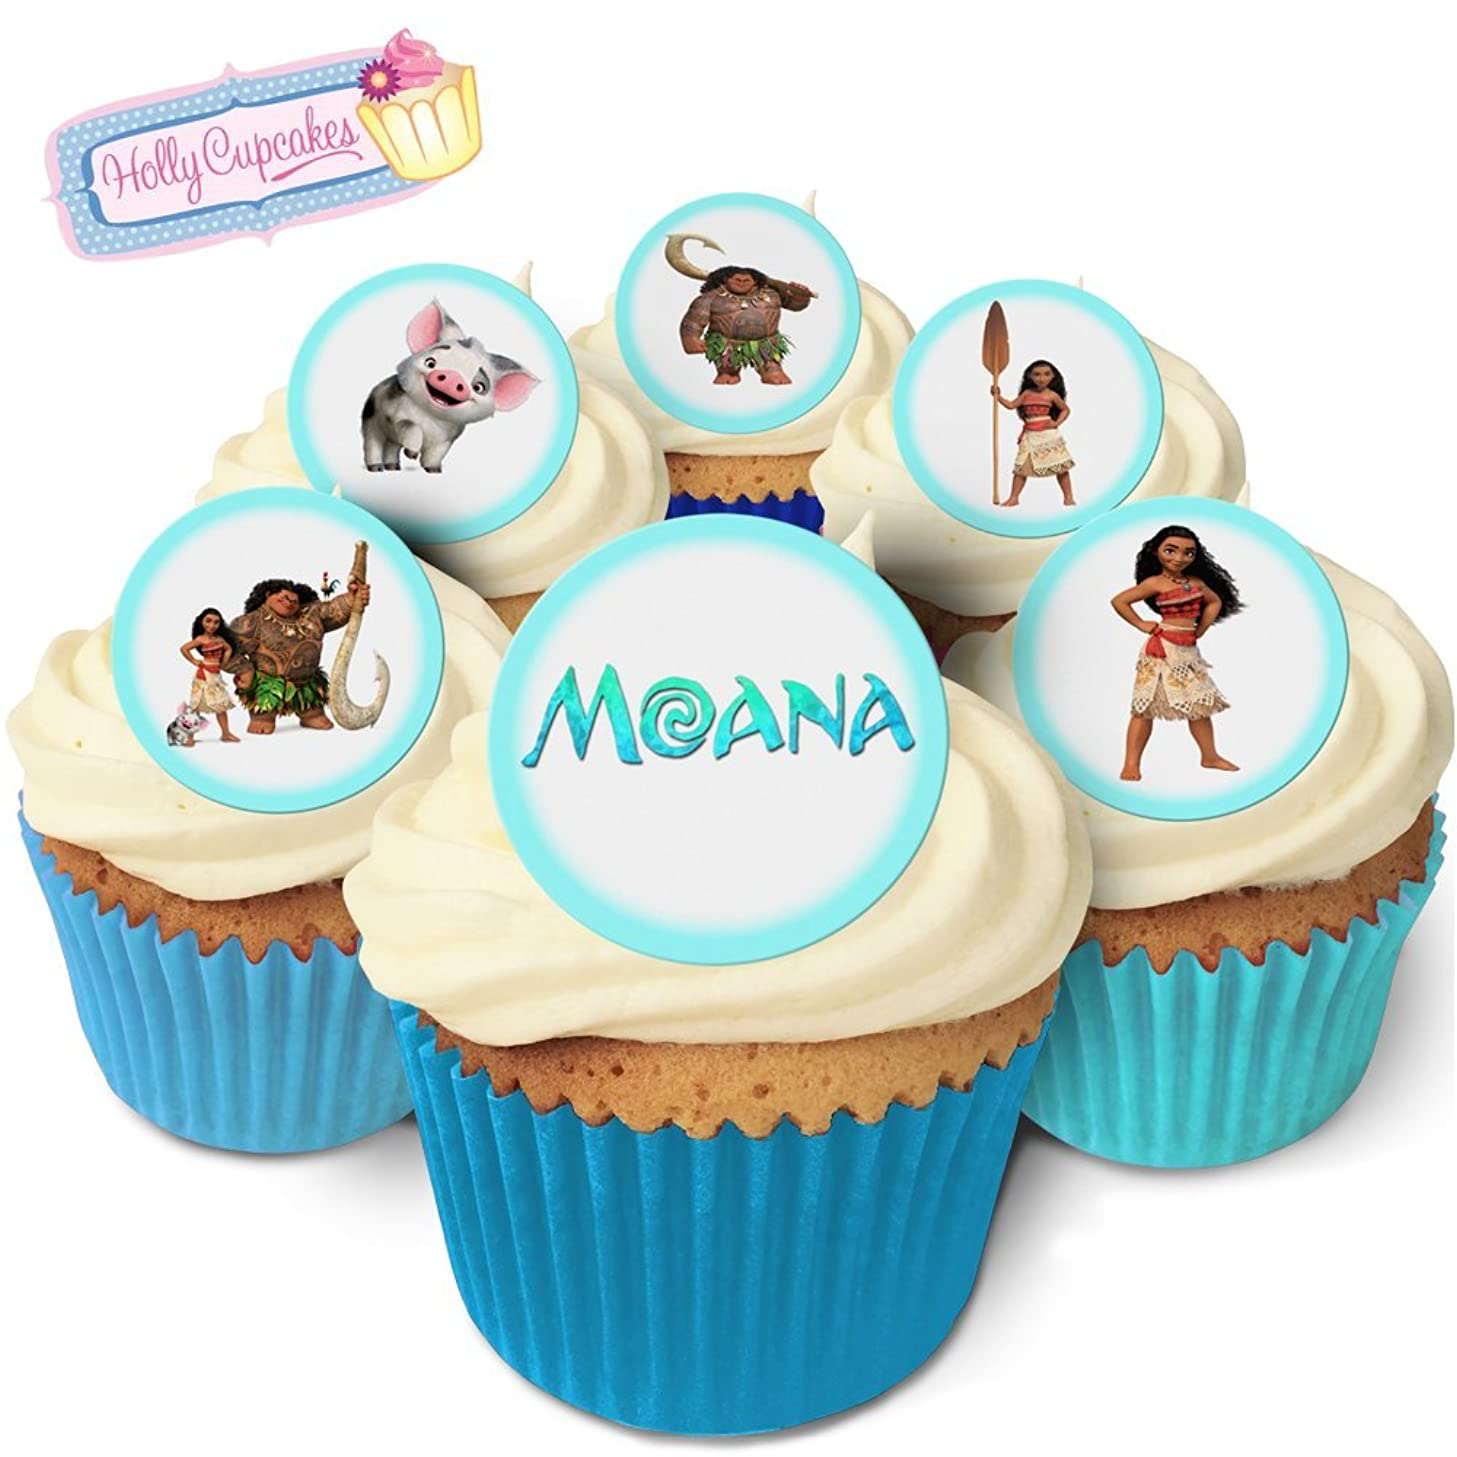 24 Fabulous Edible Wafer Cake Toppers: Moana